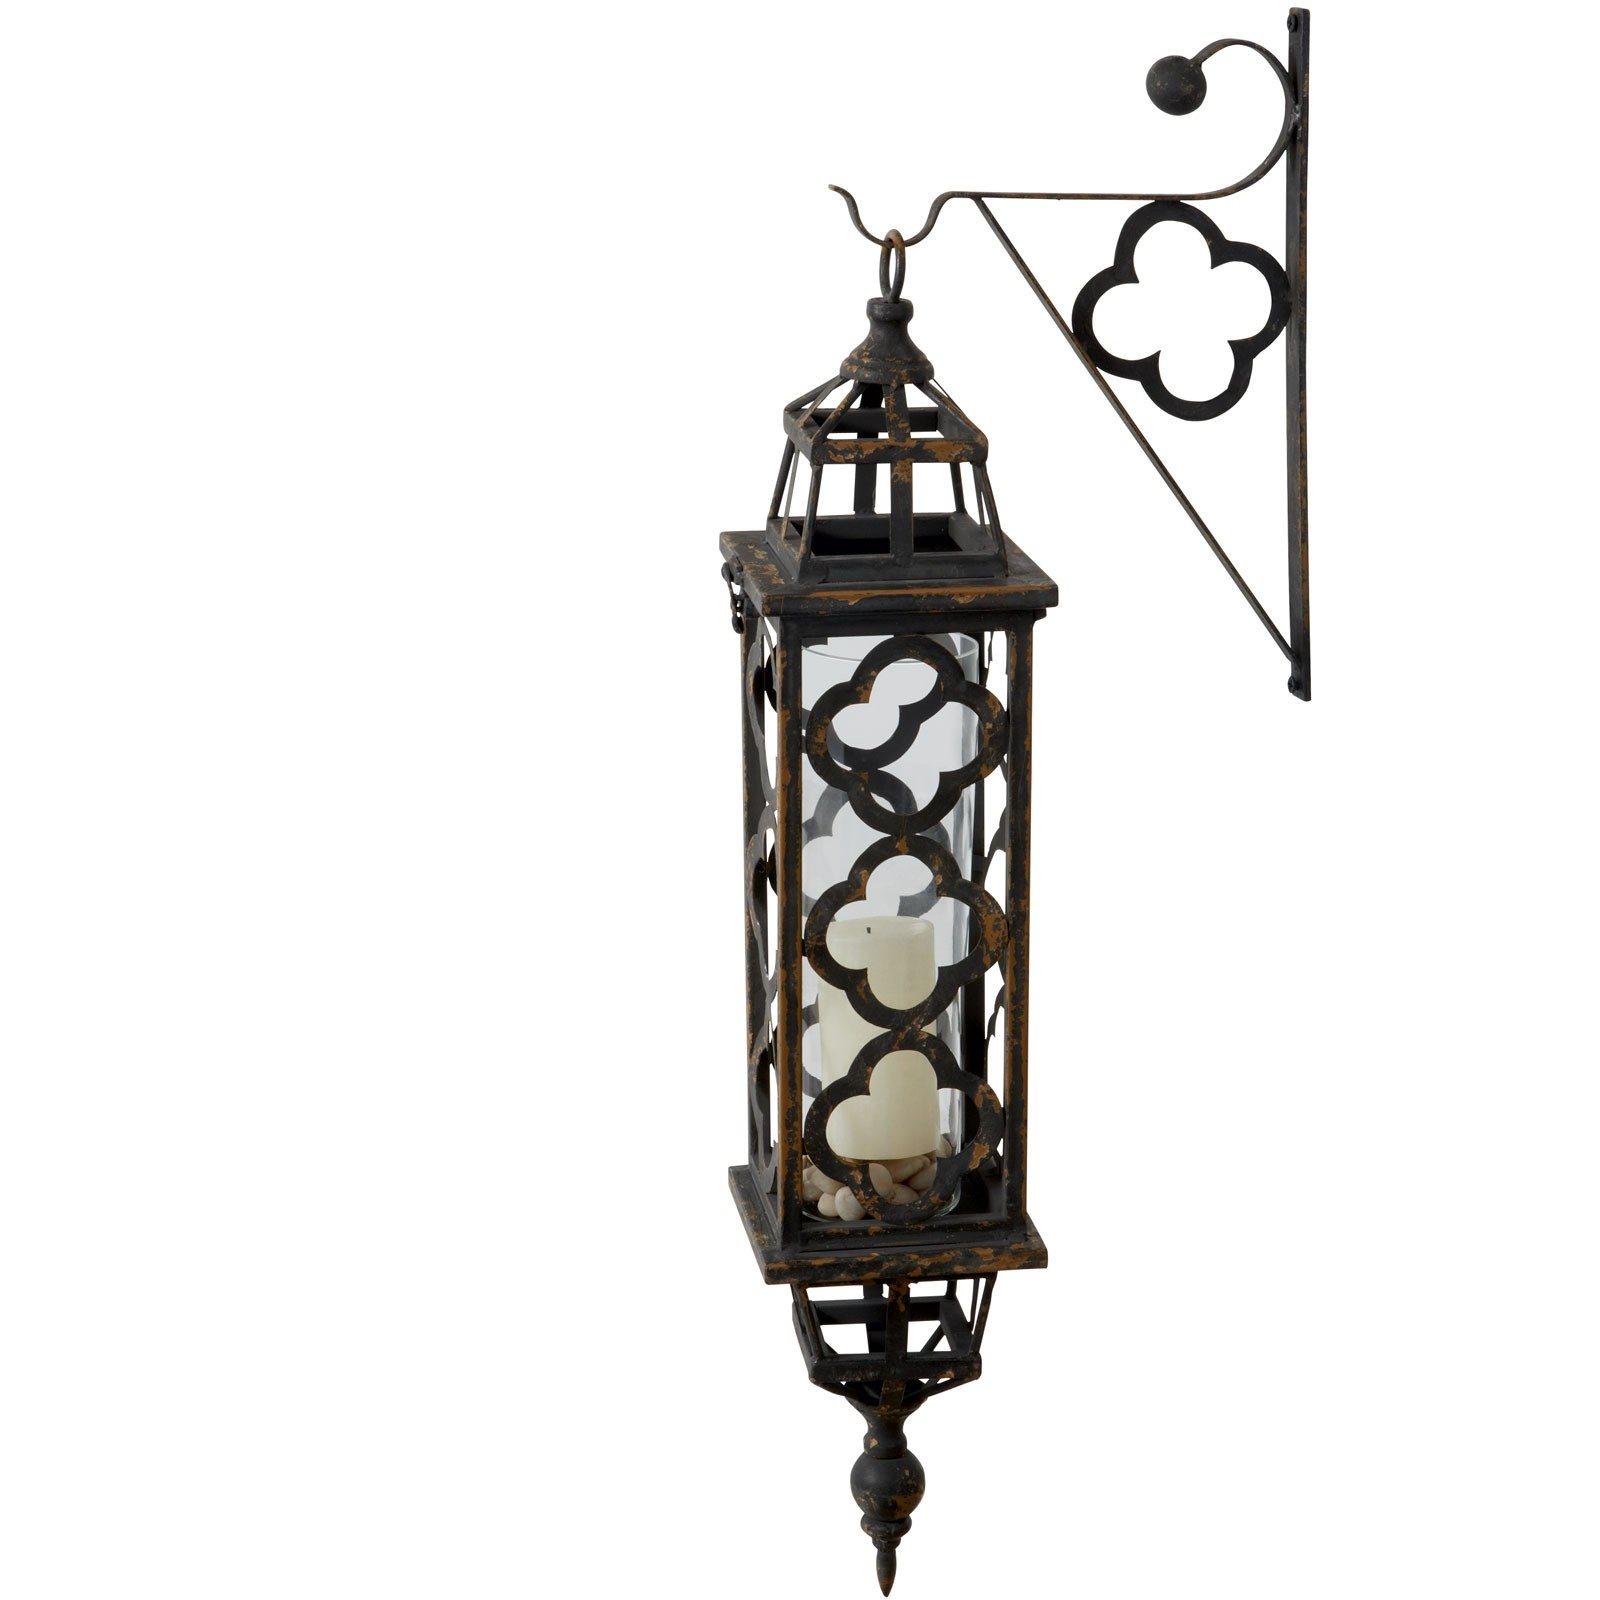 Dimond 594033 Aged Black Quatrefoil Lantern LZS-594033